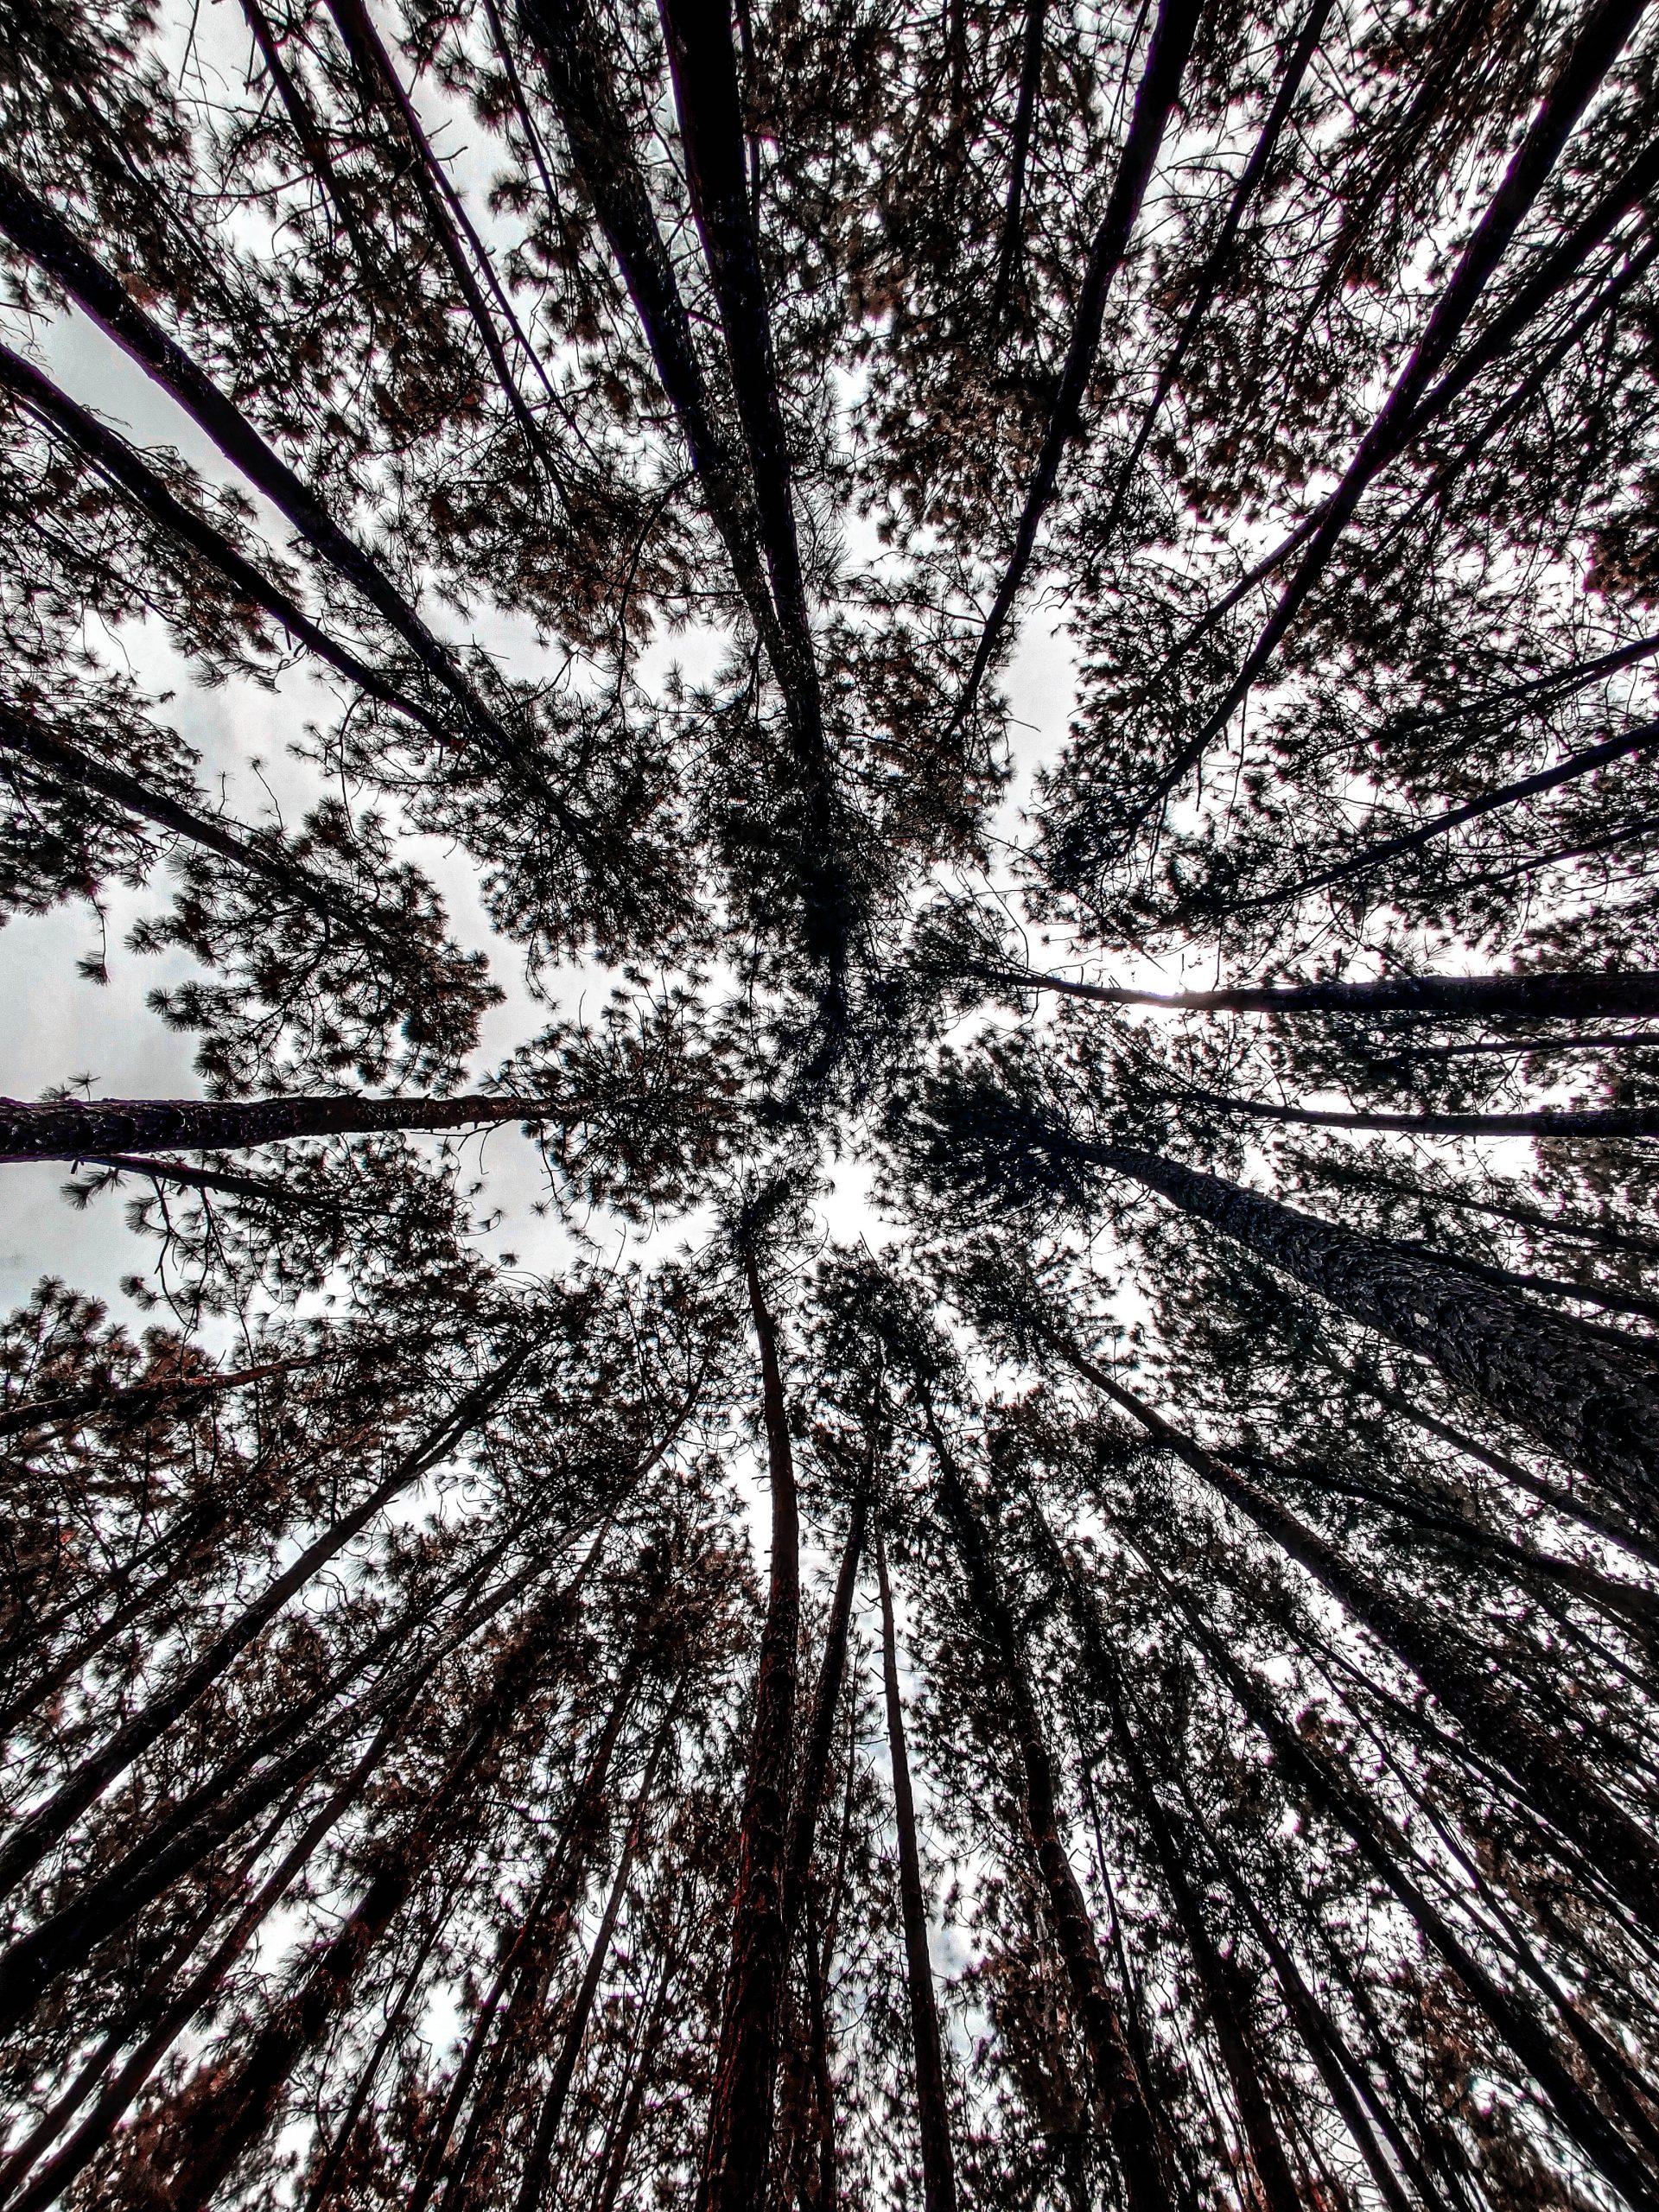 low angle shot of pine trees